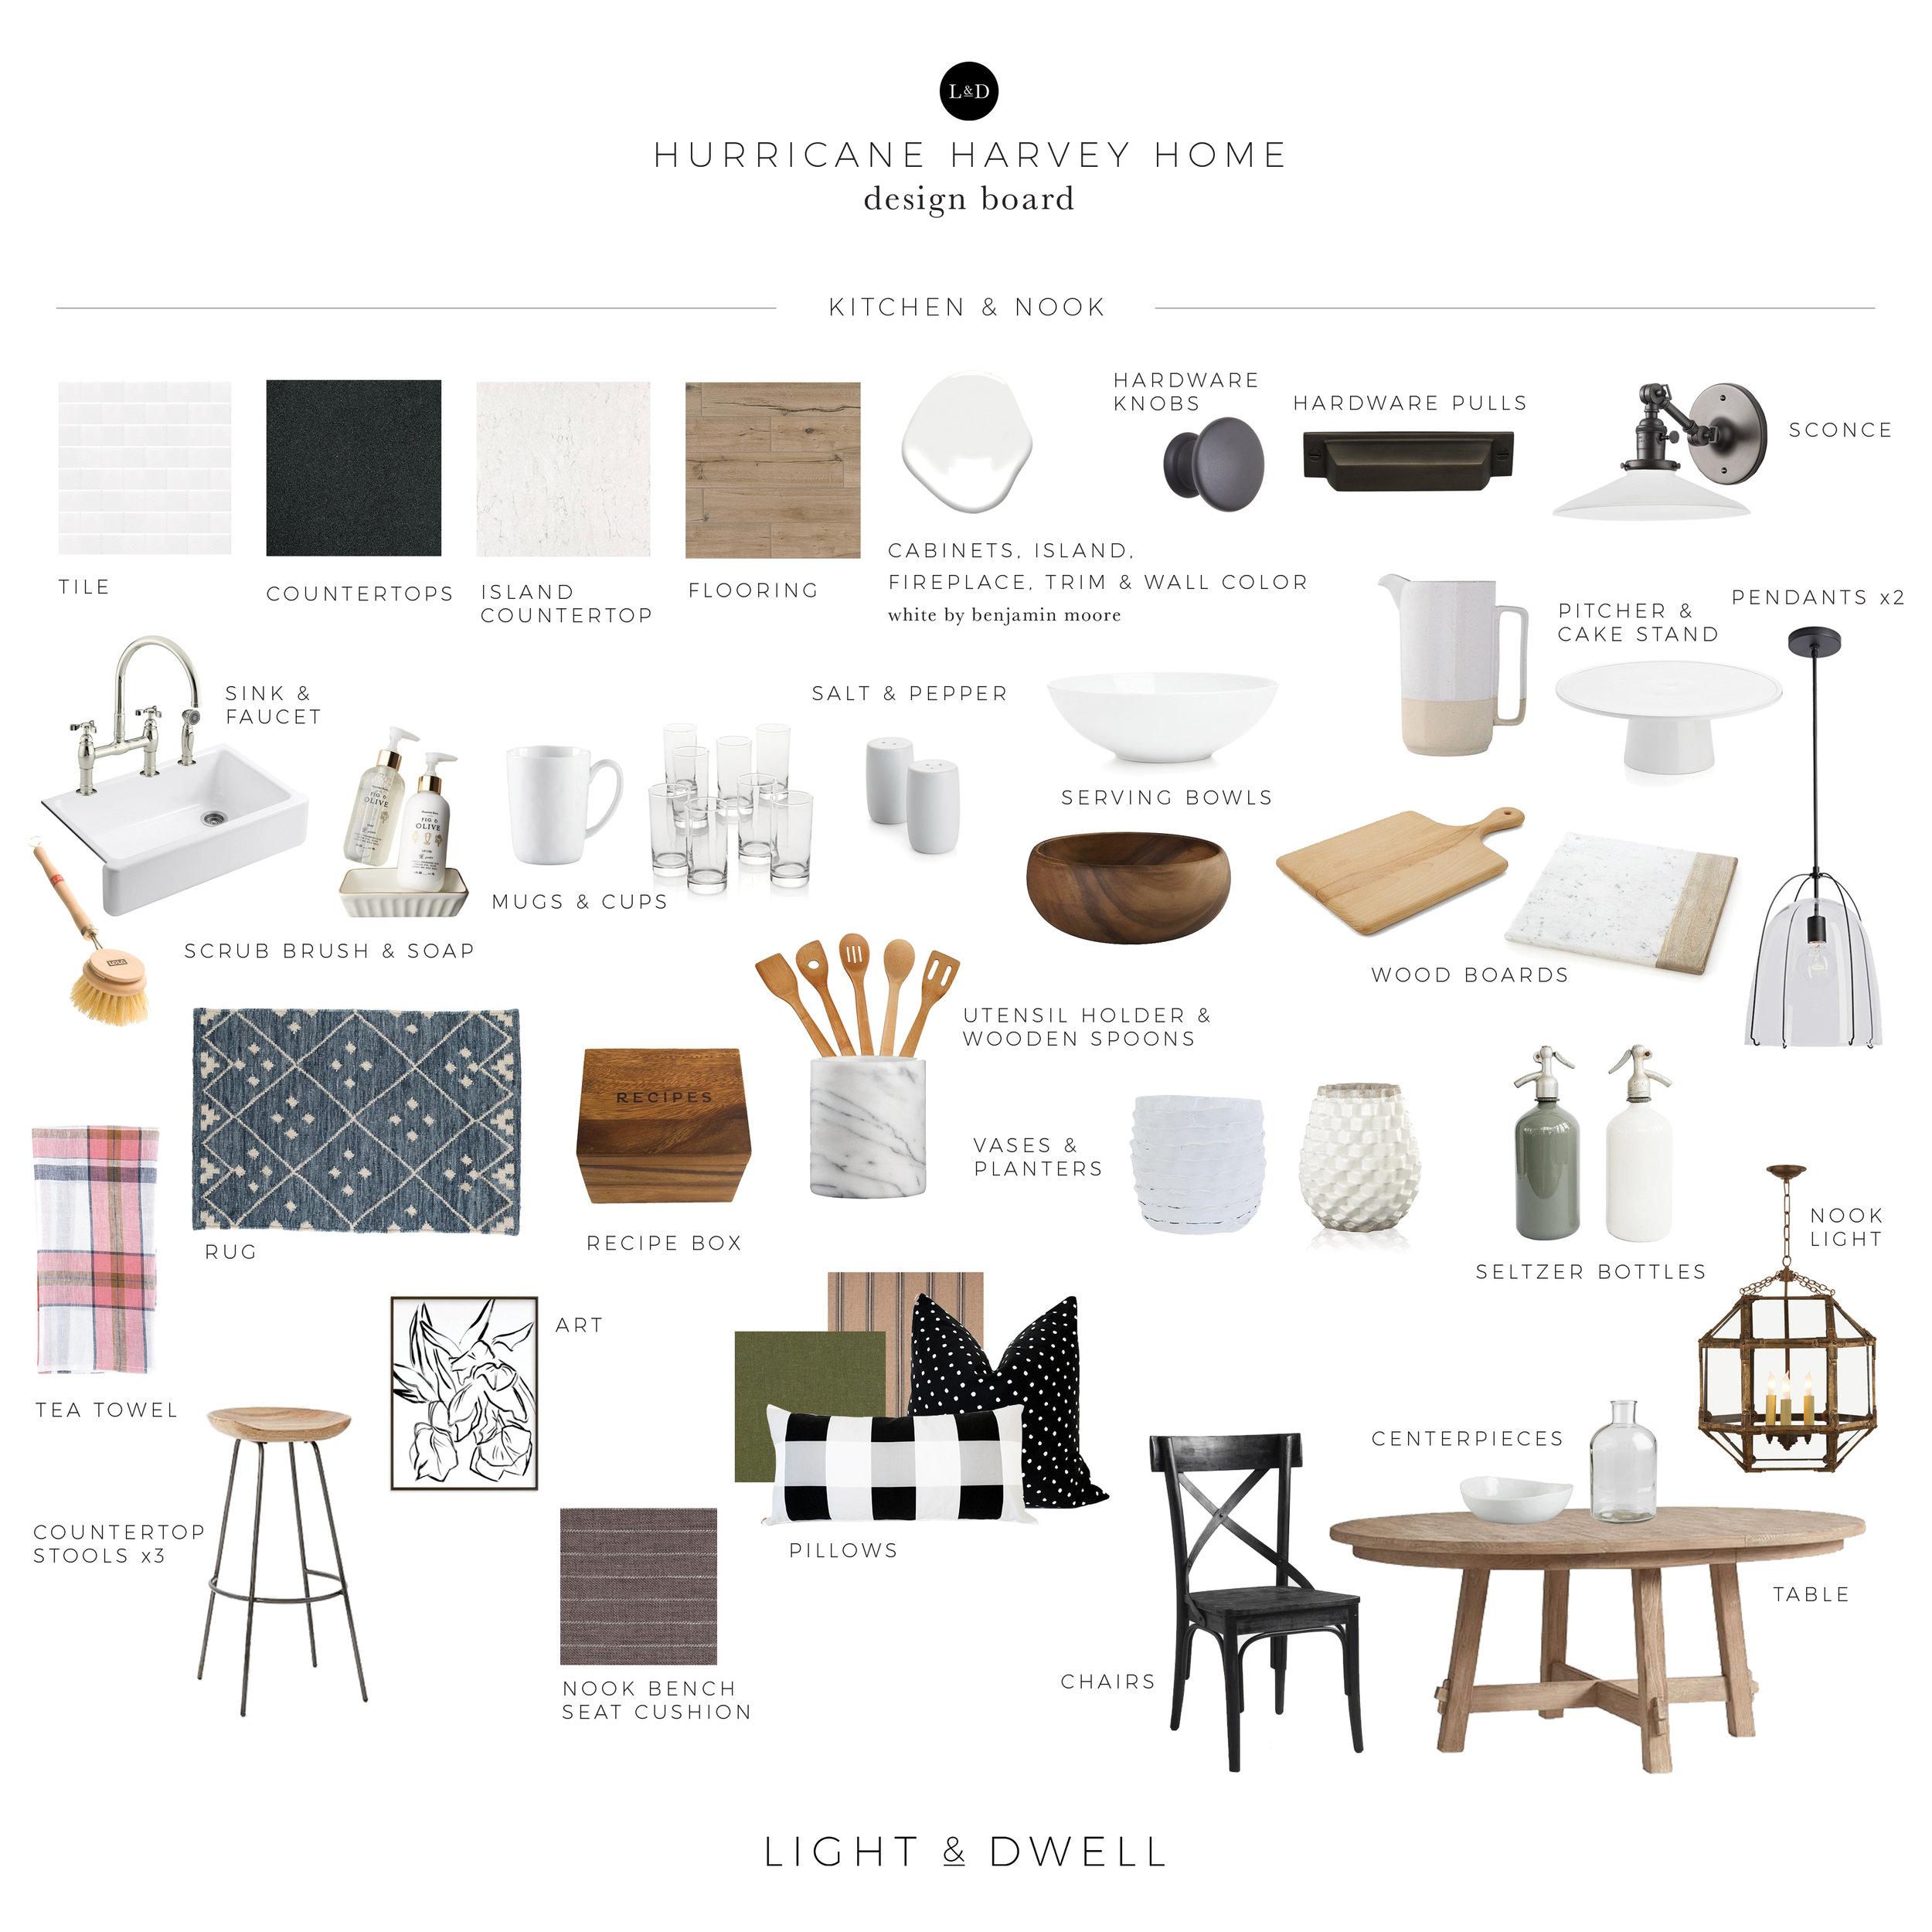 L+D_HurricaneHarvey_Kitchen&Nook.jpg